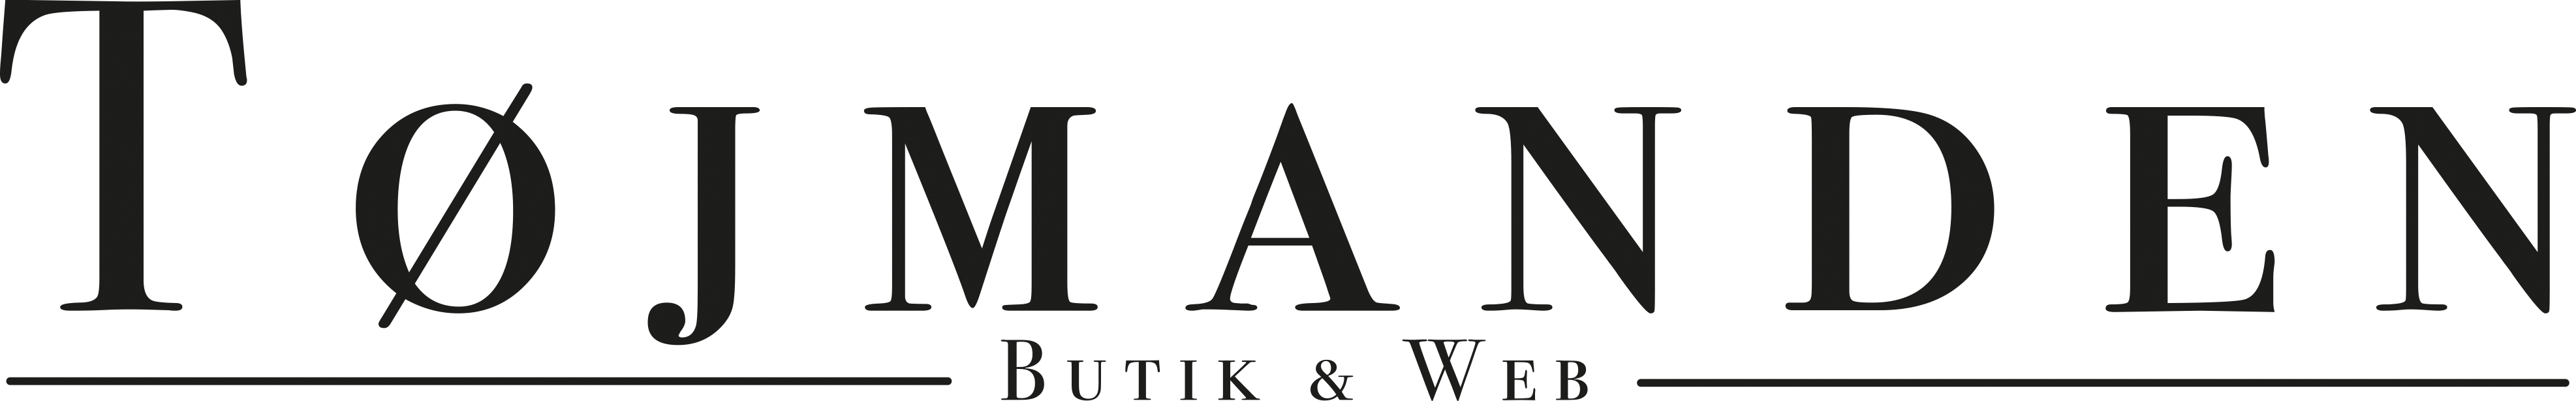 Tøjmanden.dk – Butik & Webshop i Rudkøbing